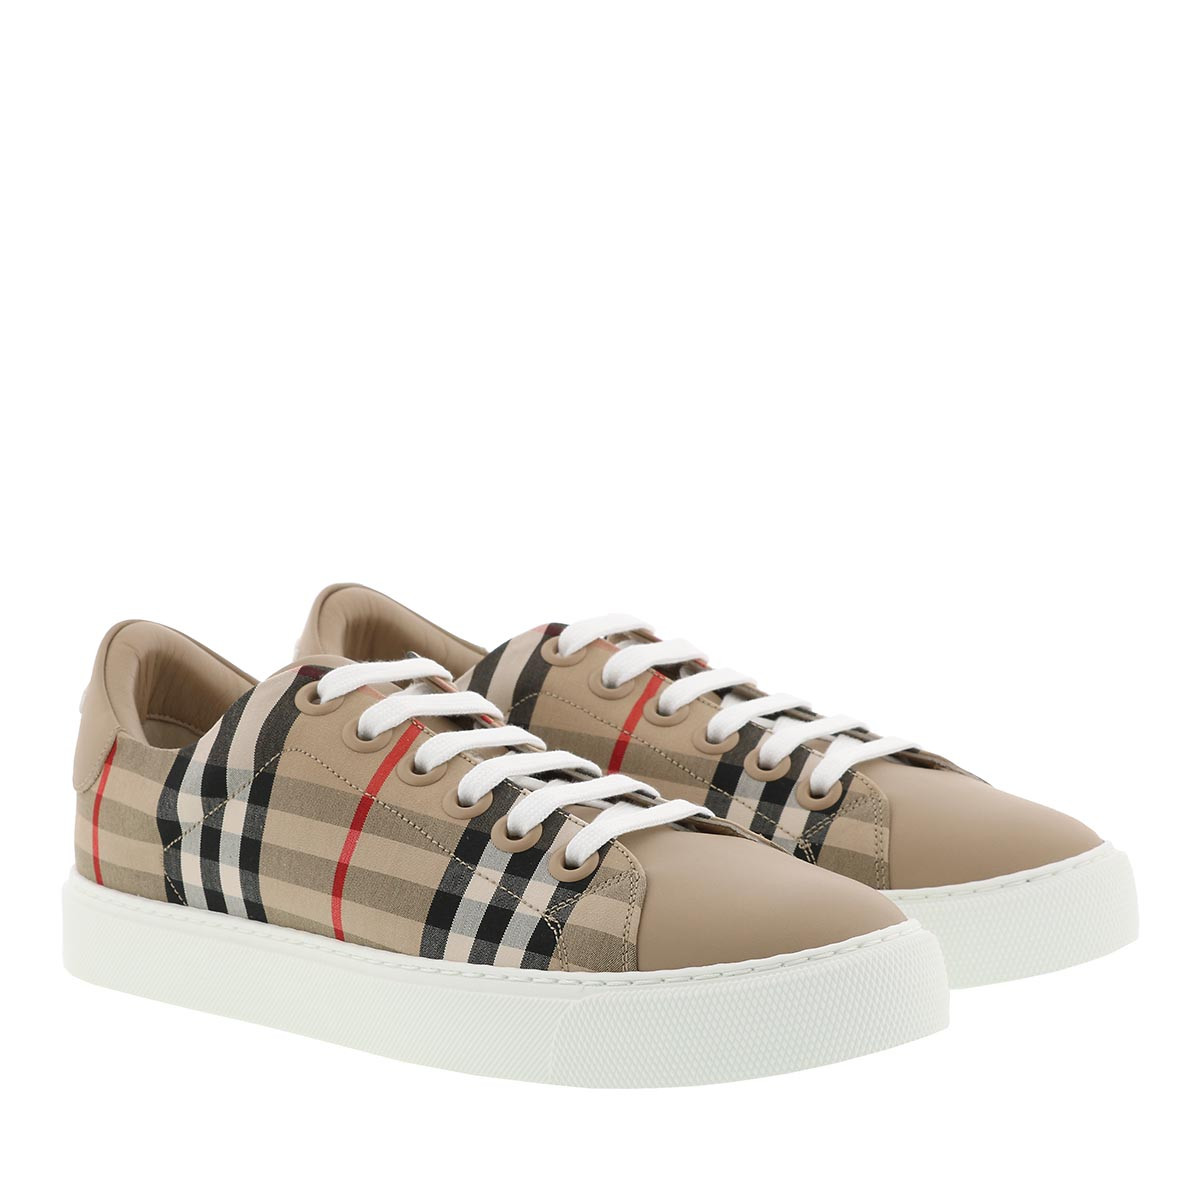 Burberry Sneakers - Checked Motif Sneaker Archive Beige - in beige - für Damen